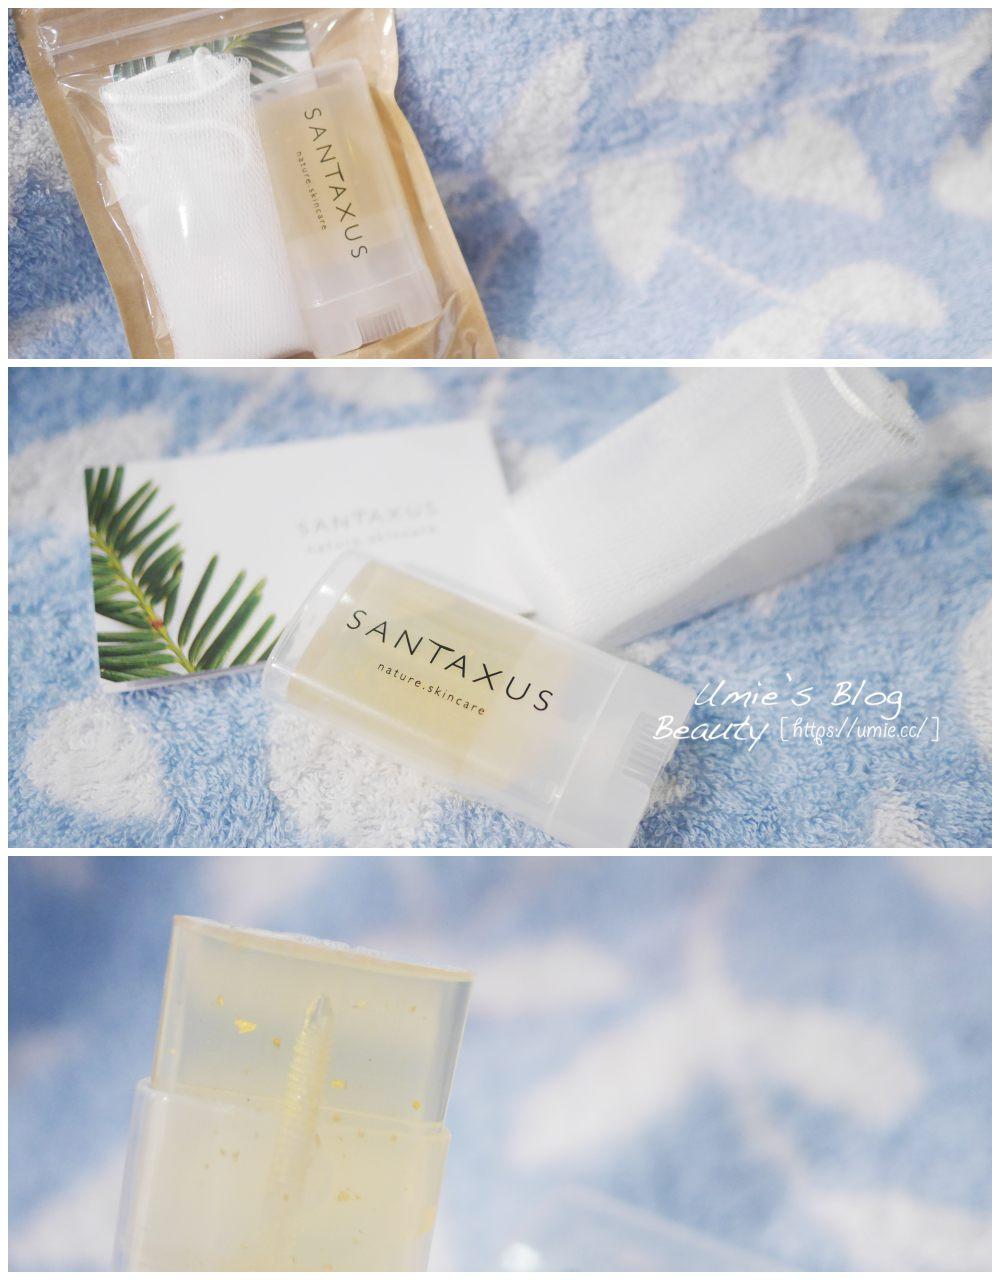 SANTAXUS® 紅豆杉|用第一次就愛上!杉之淬活煥金純修護凝磚(大推痘痘肌、問題肌膚)